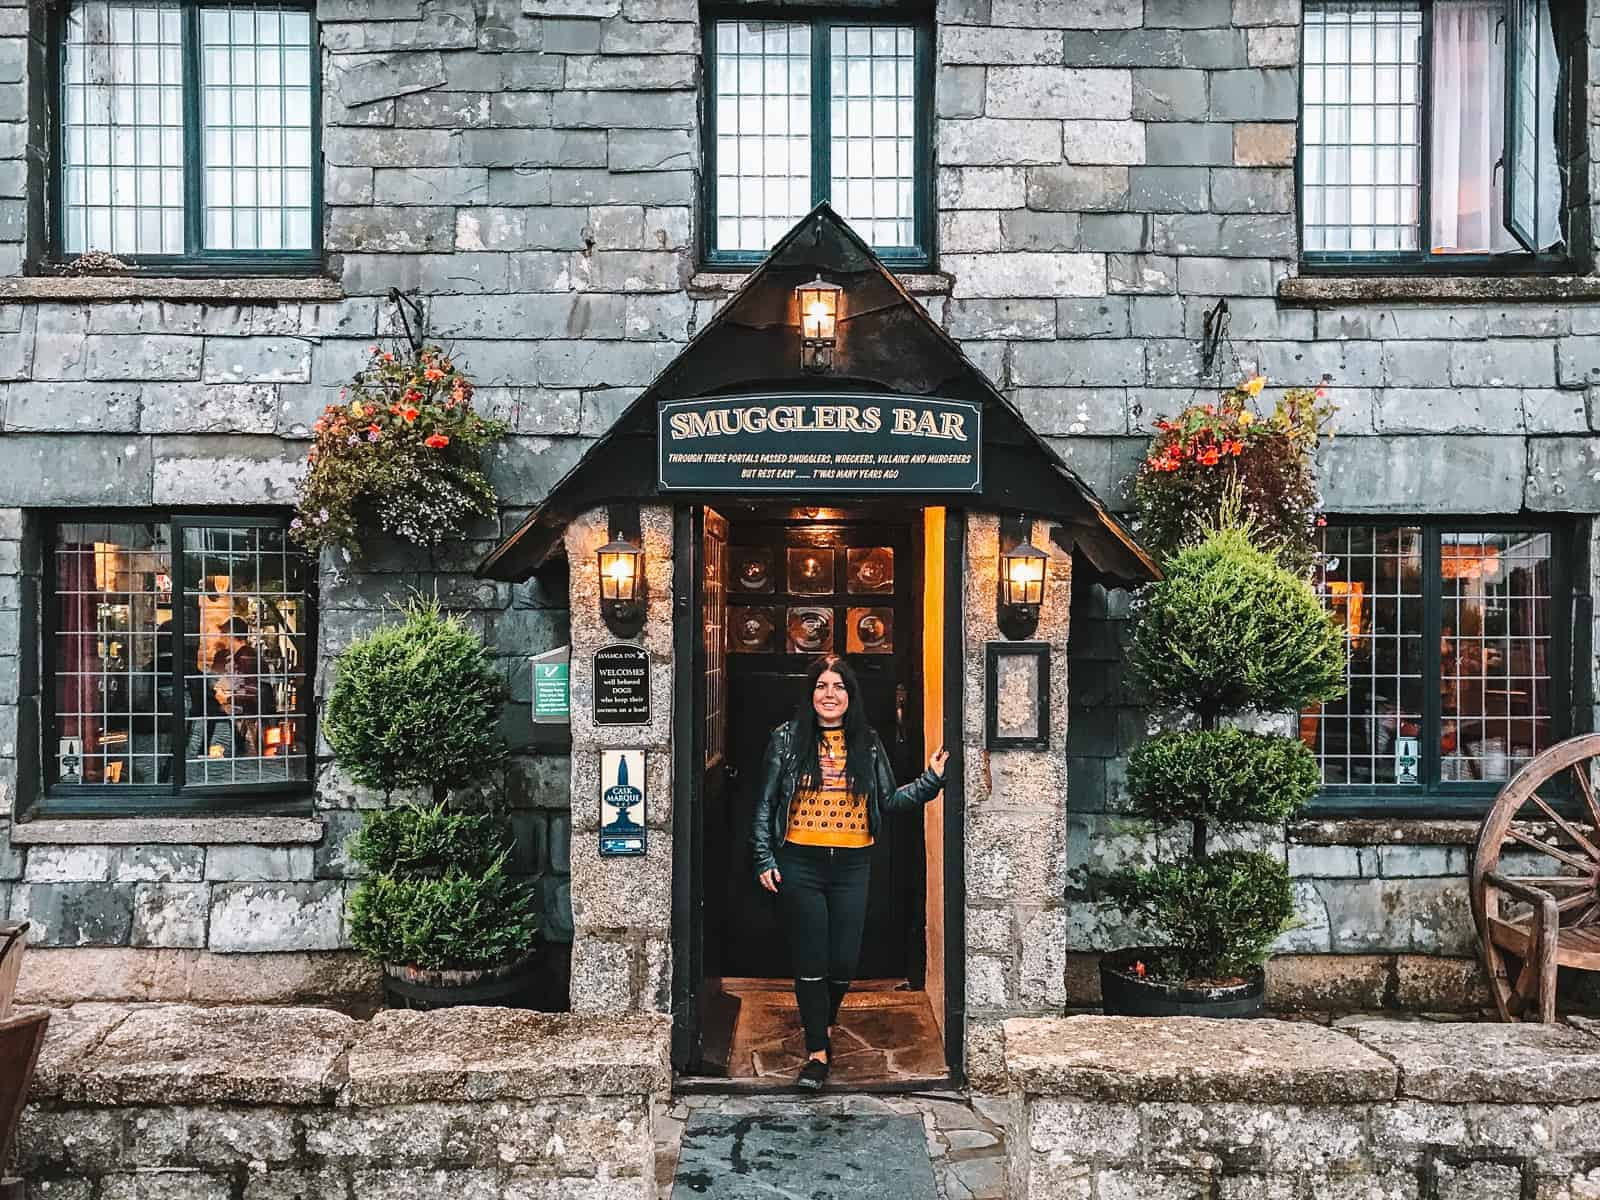 The Jamaica Inn Cornwall